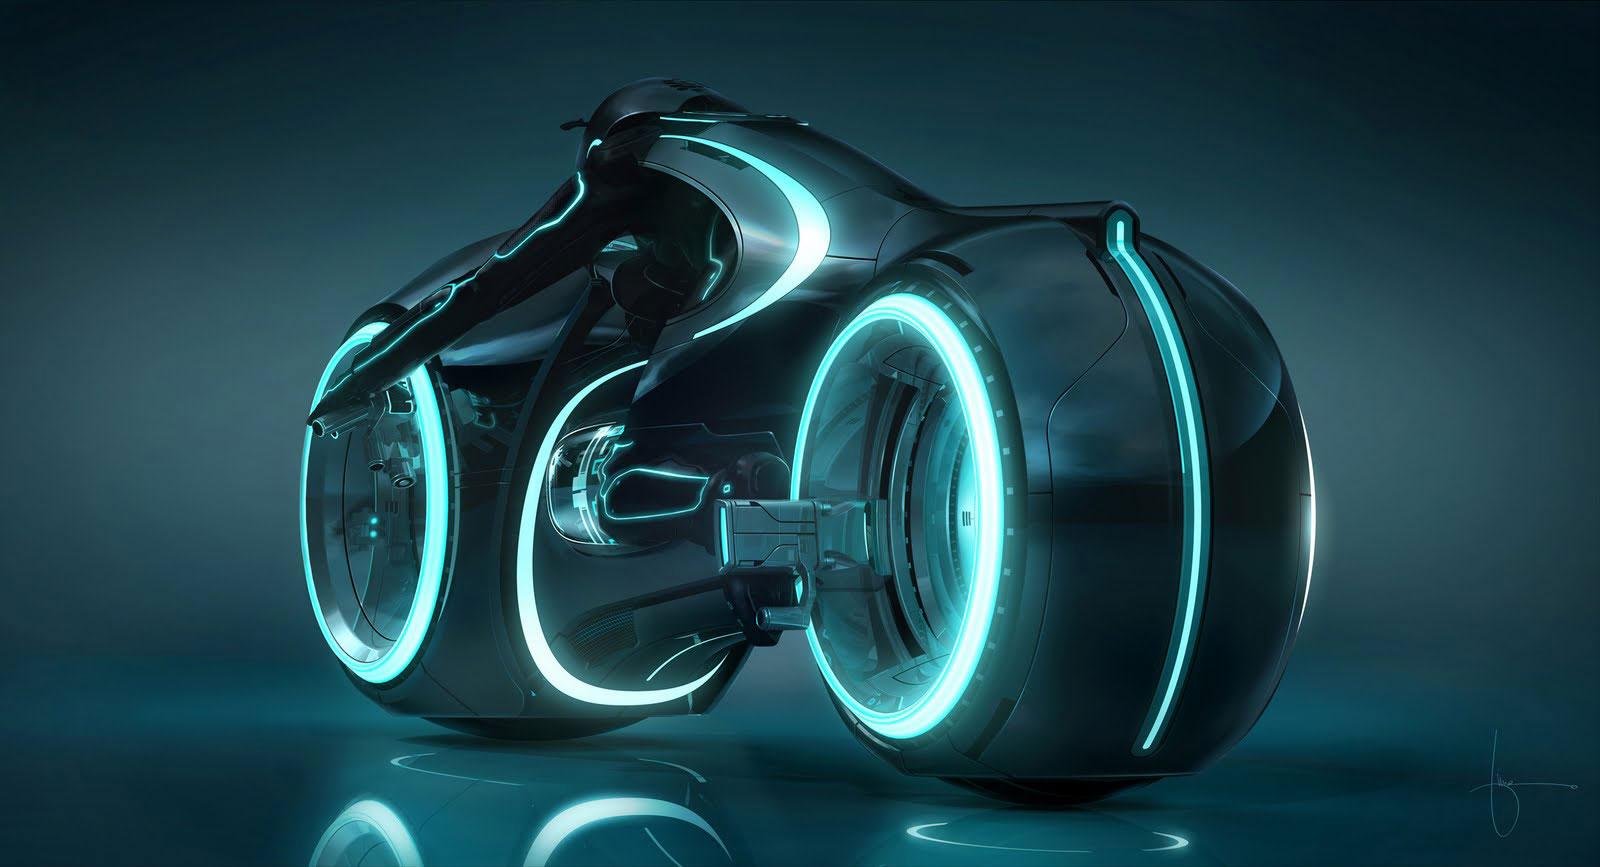 lotus and daniel simon start motorcycles division car. Black Bedroom Furniture Sets. Home Design Ideas